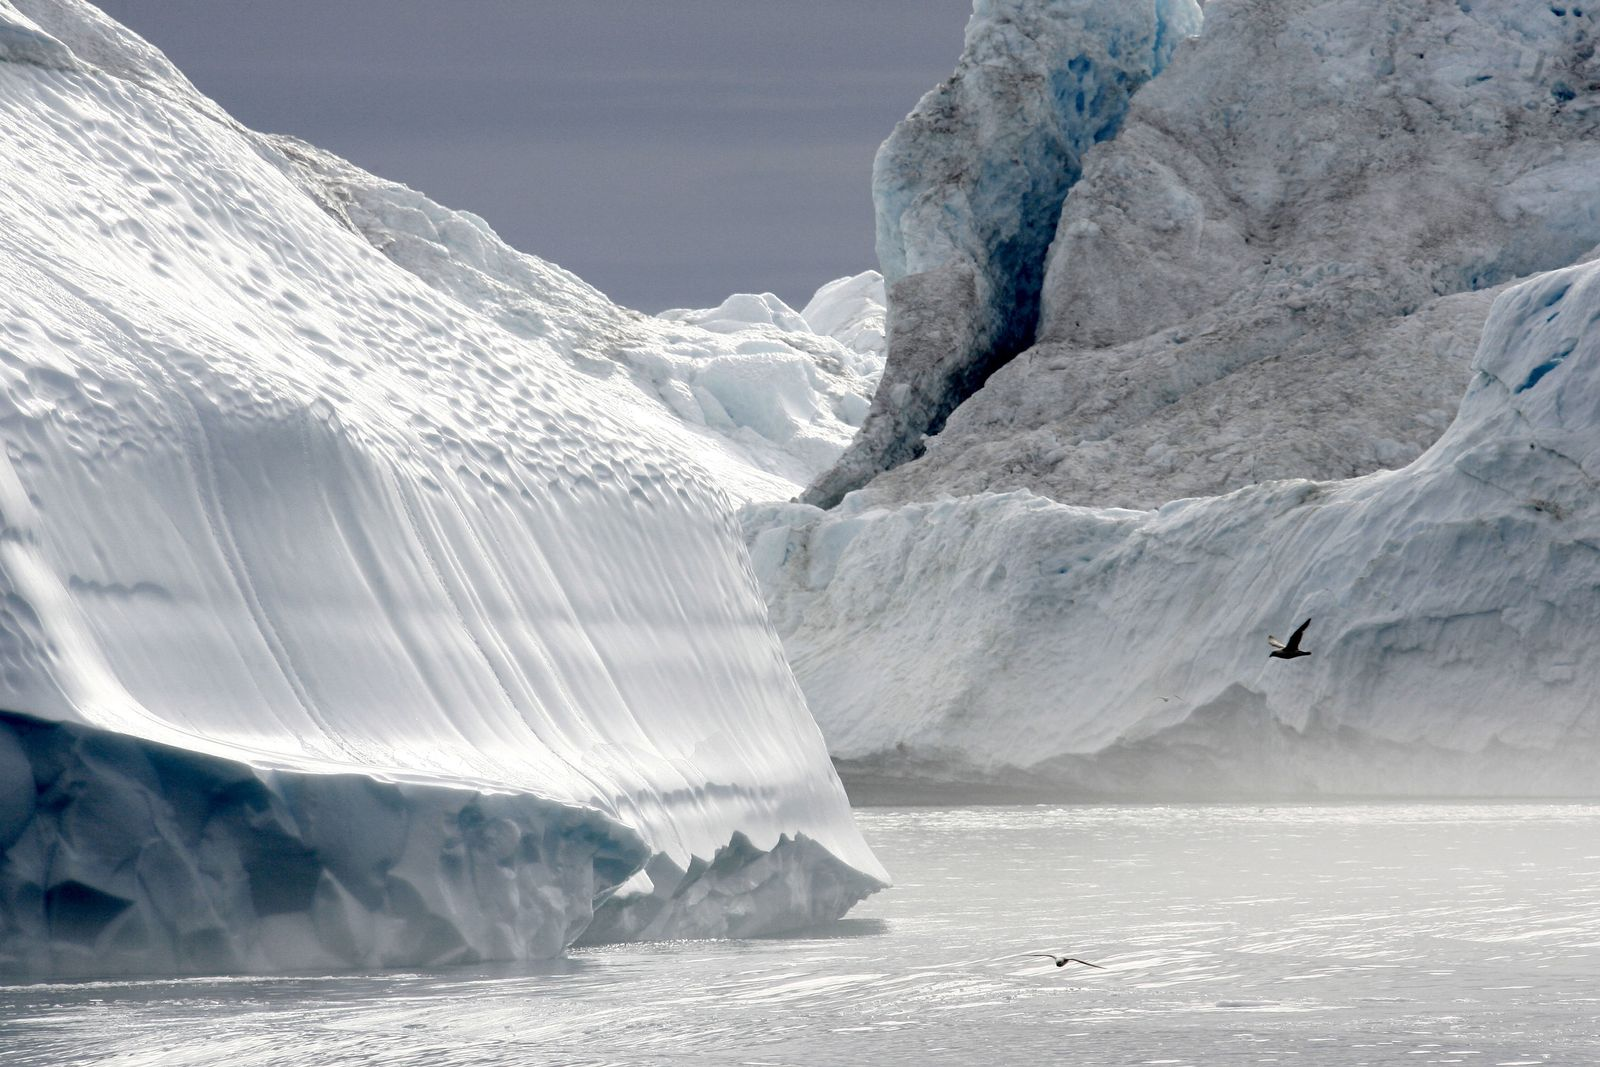 Arktis Eisberge